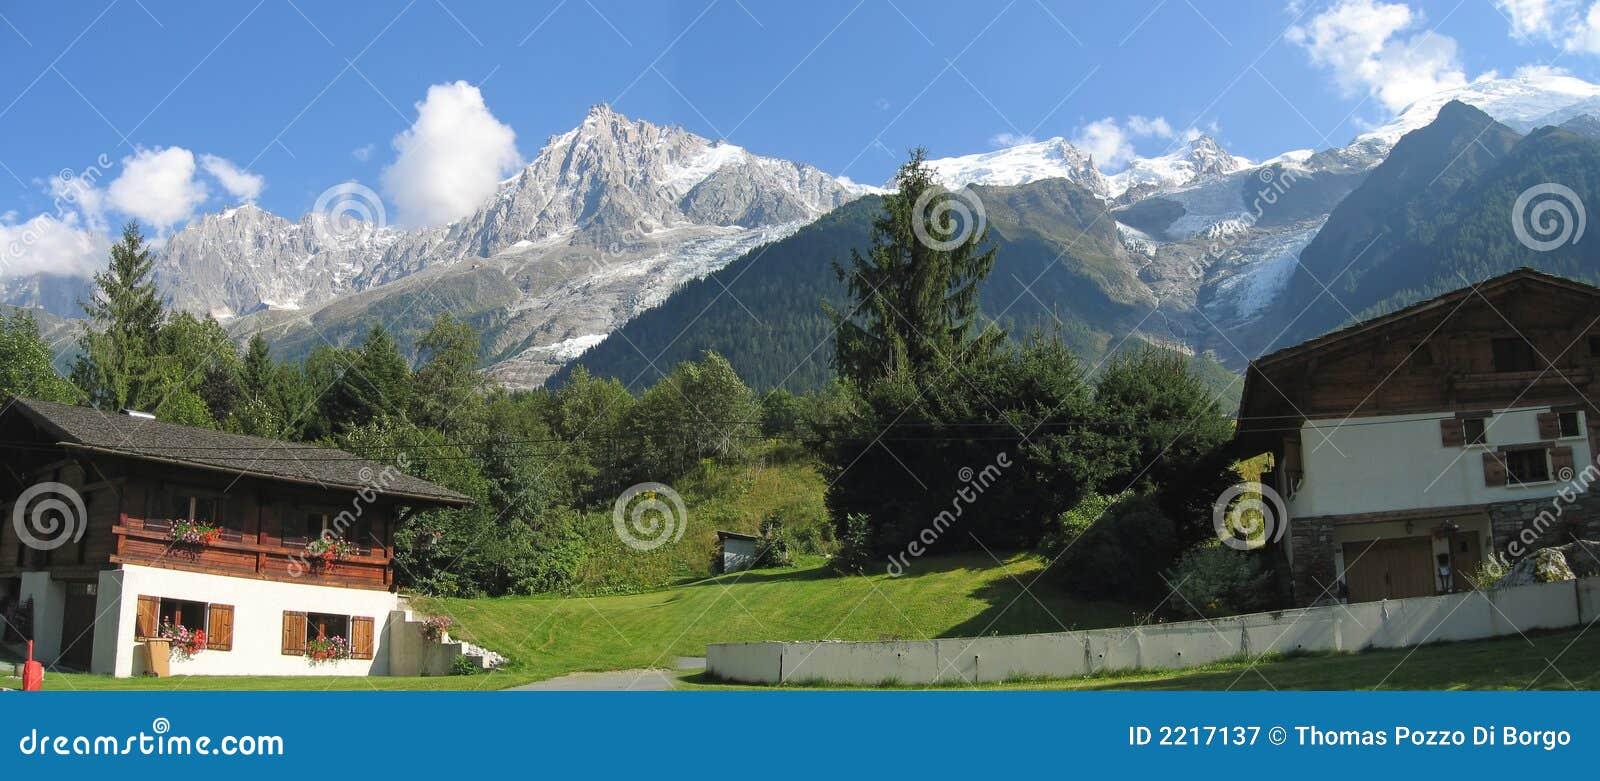 Casa de Moutain en el Chamonix